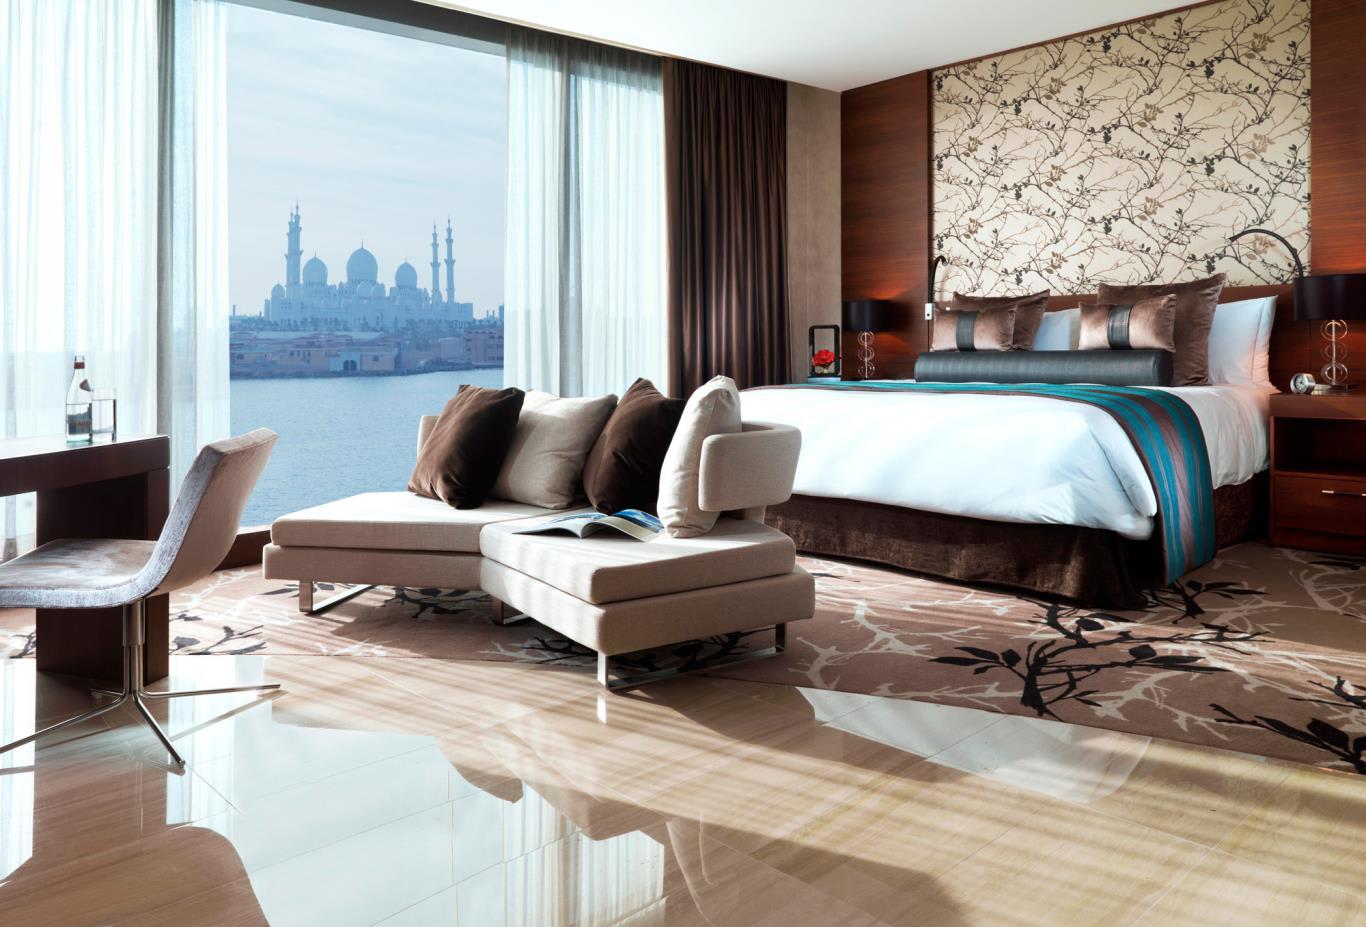 Fairmont-View-Room